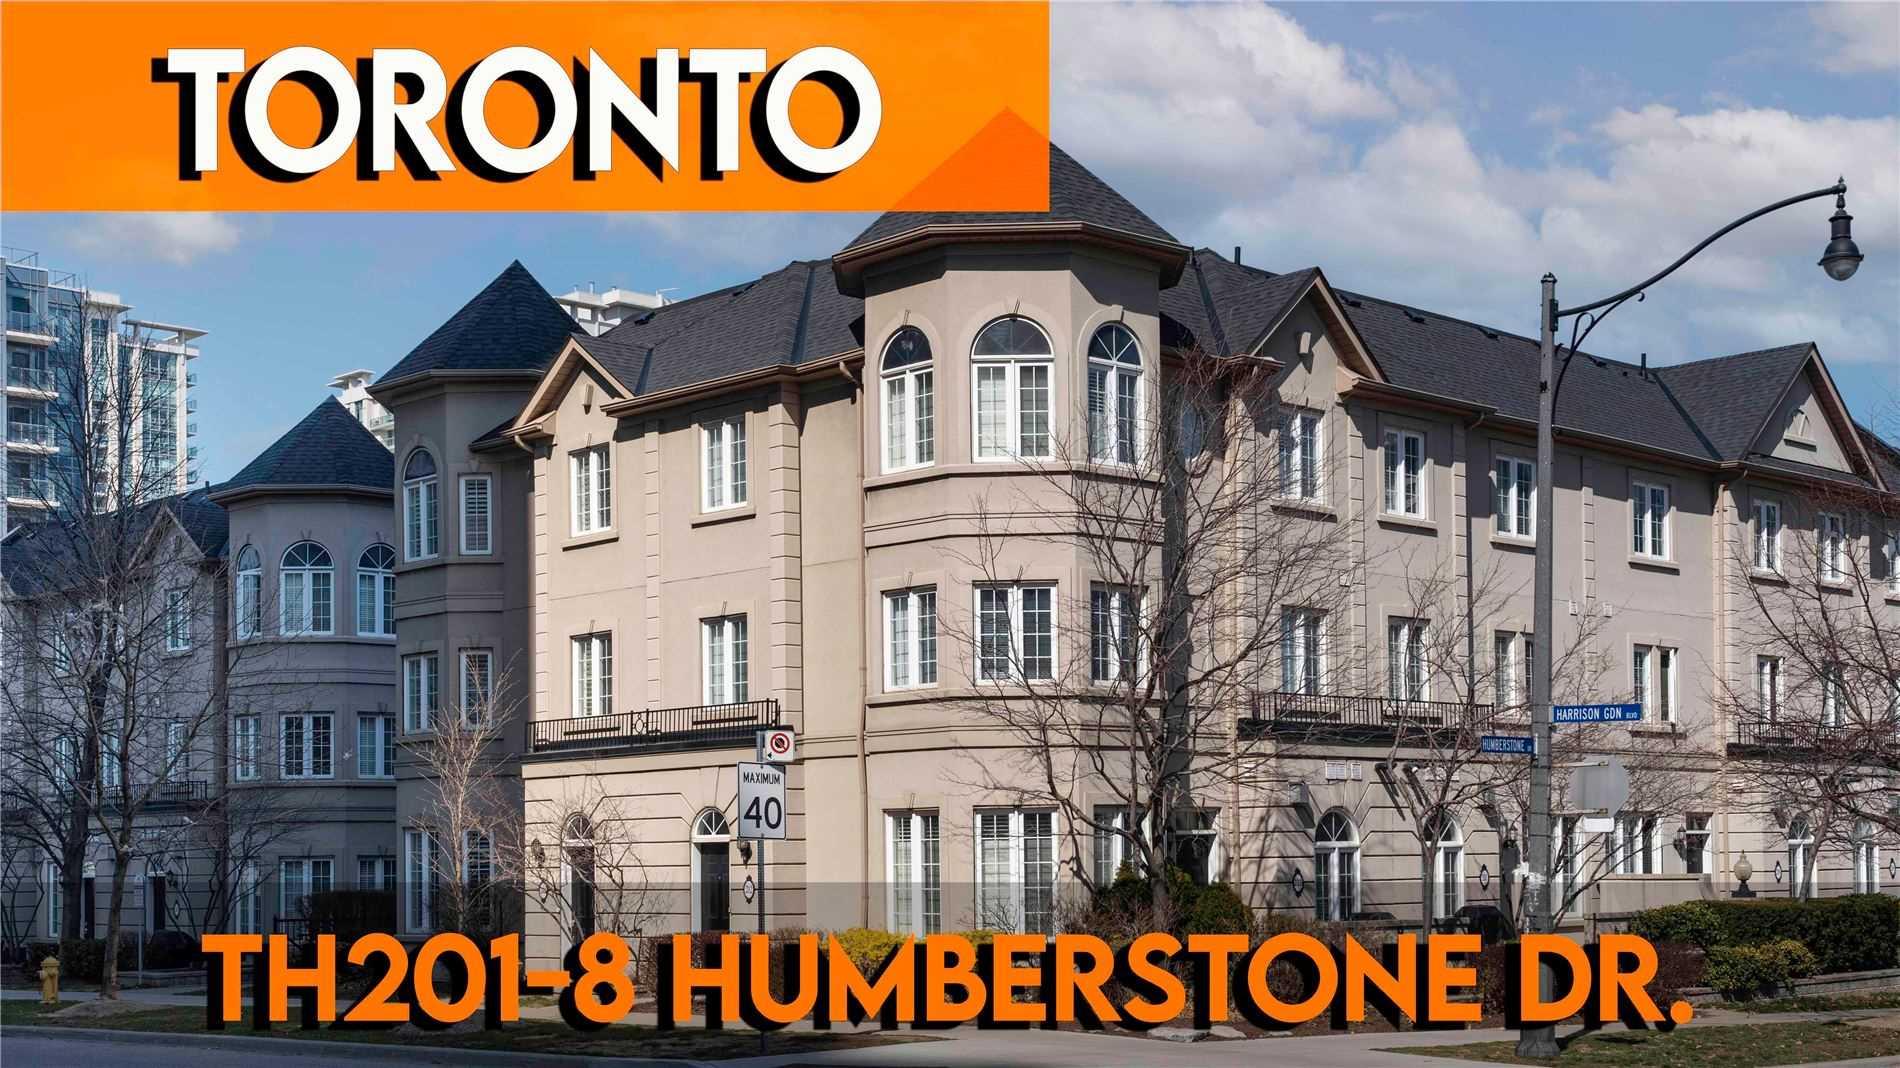 201 - 8 Humberstone Dr